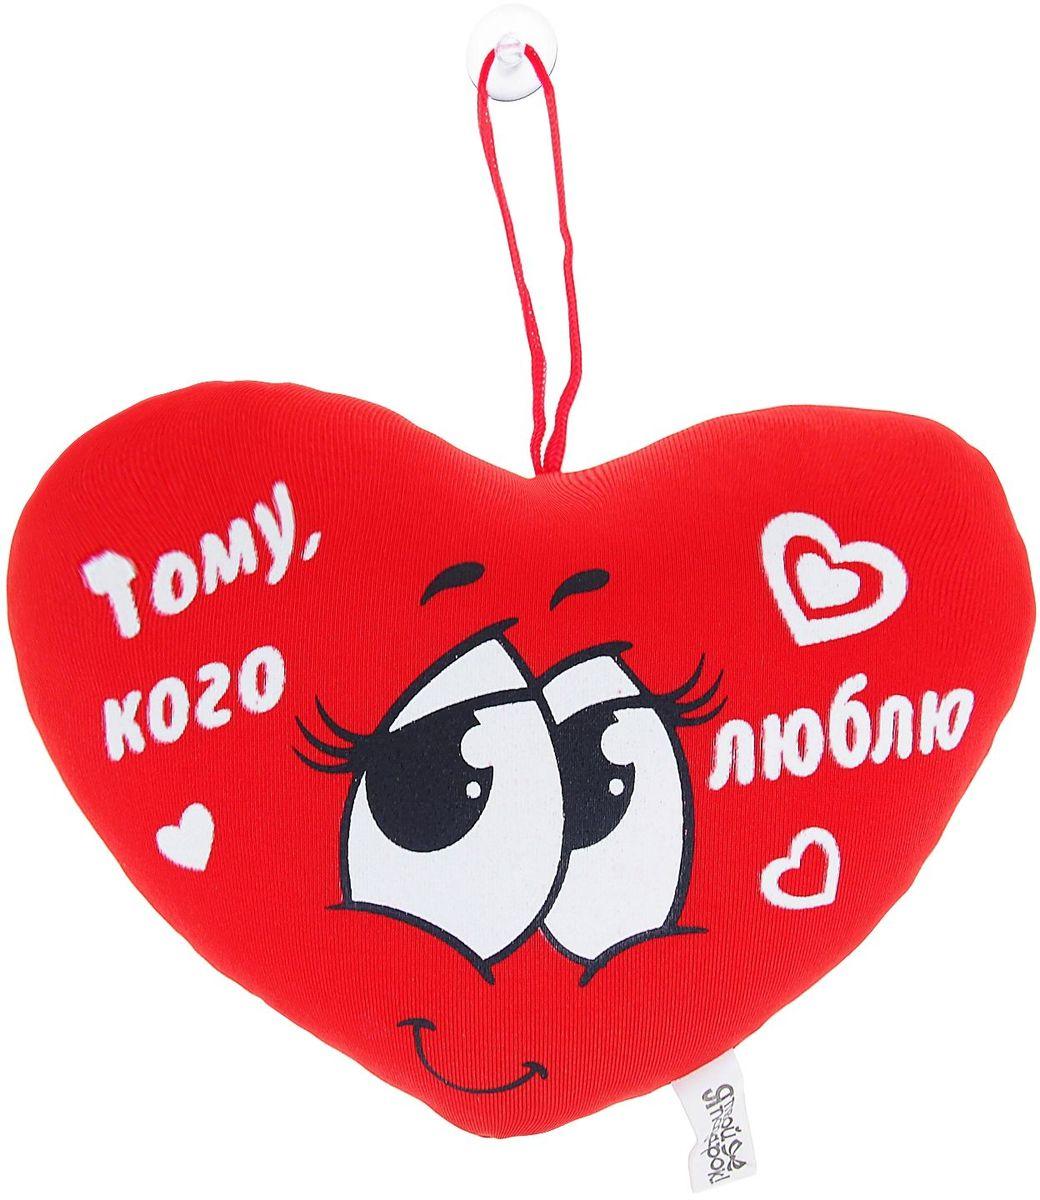 Sima-land Мягкая игрушка-антистресс Сердечко Тому, кого люблю 864924 игрушка антистресс сима ленд сердечко 330476